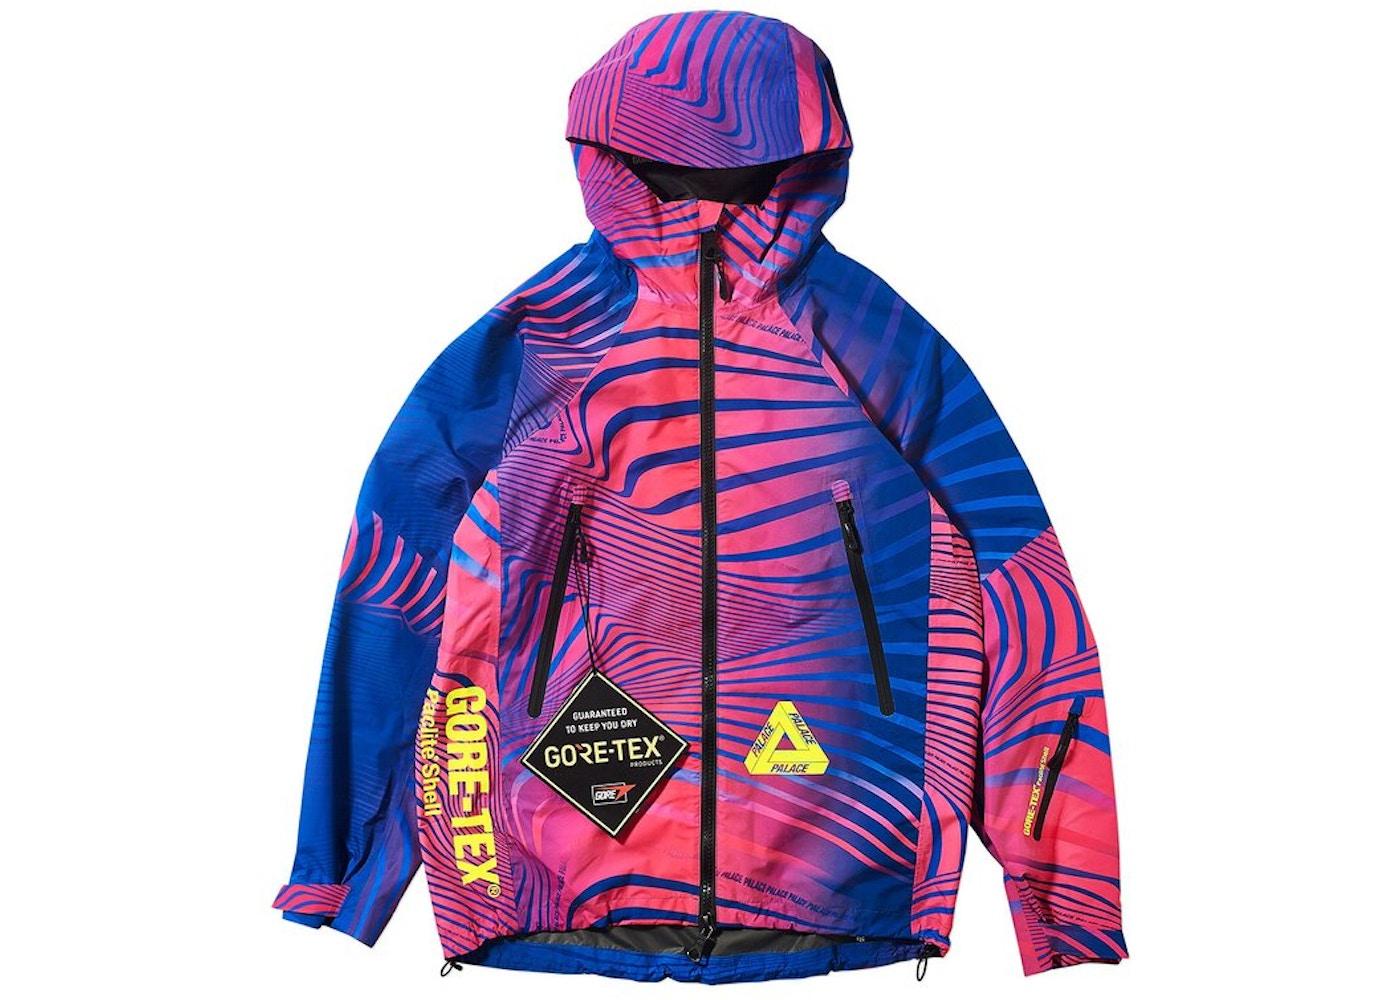 d6966a1de62b Palace Gore-Tex Vortex Paclite Jacket Pink - FW18